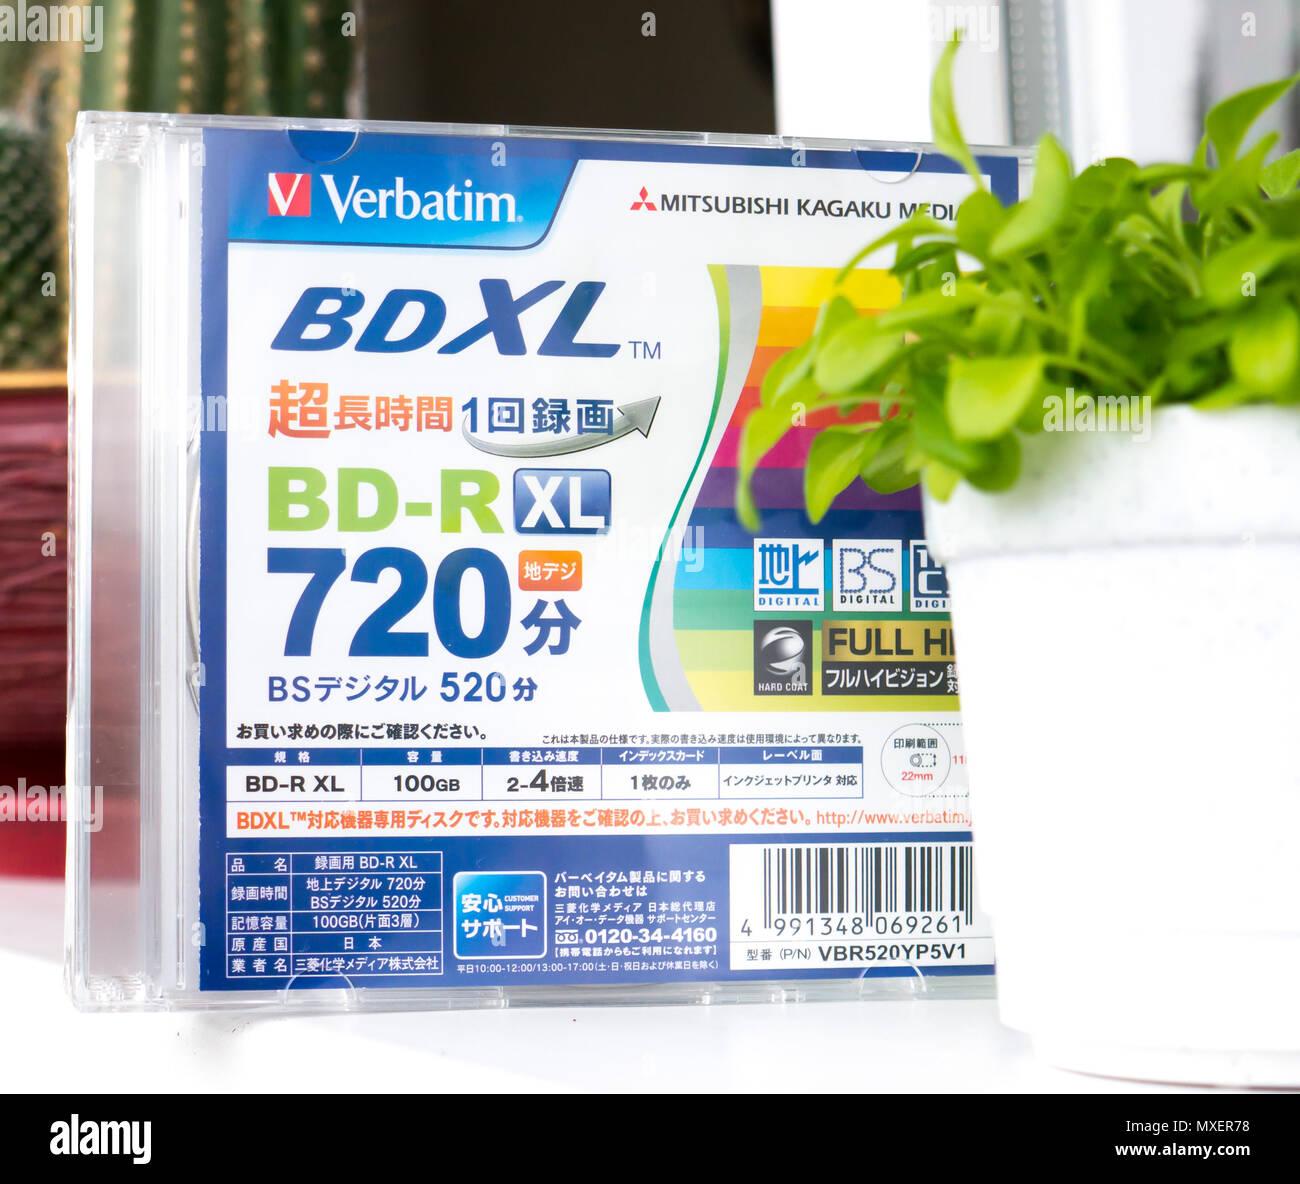 GOMEL, BELARUS - MAY 30, 2018: Mitsubishi (Verbatim) BD-R XL 100GB disc on a variocolor background. - Stock Image